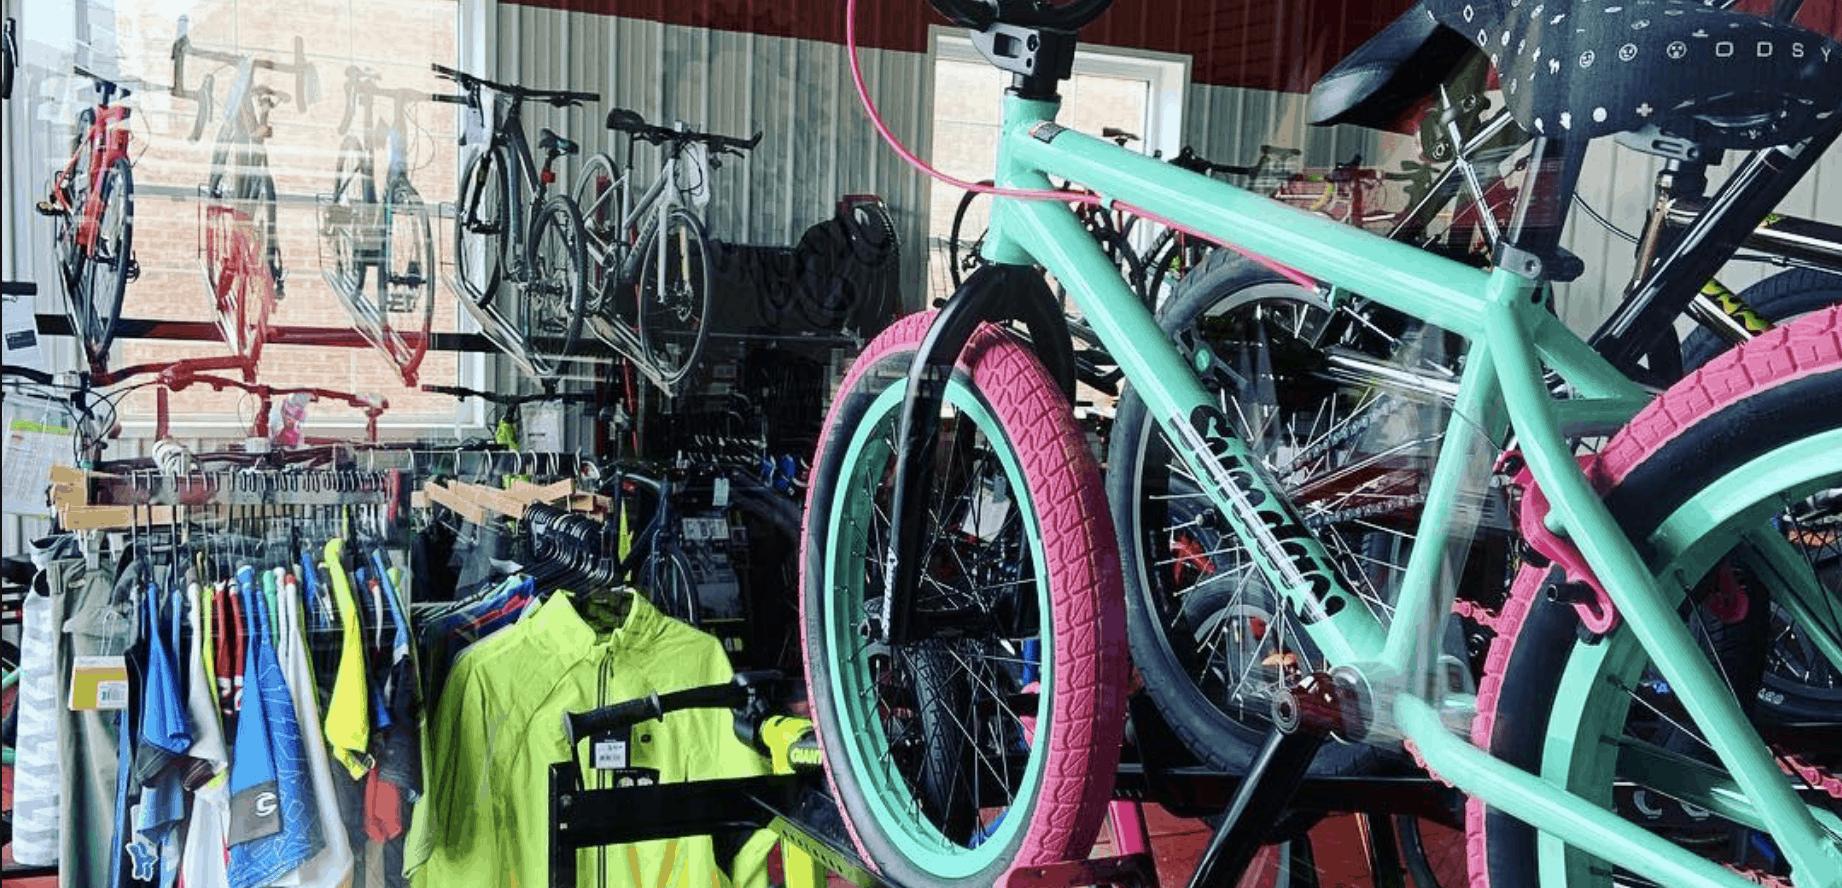 CoolByke, Bicycle Shop | Visit Hannibal